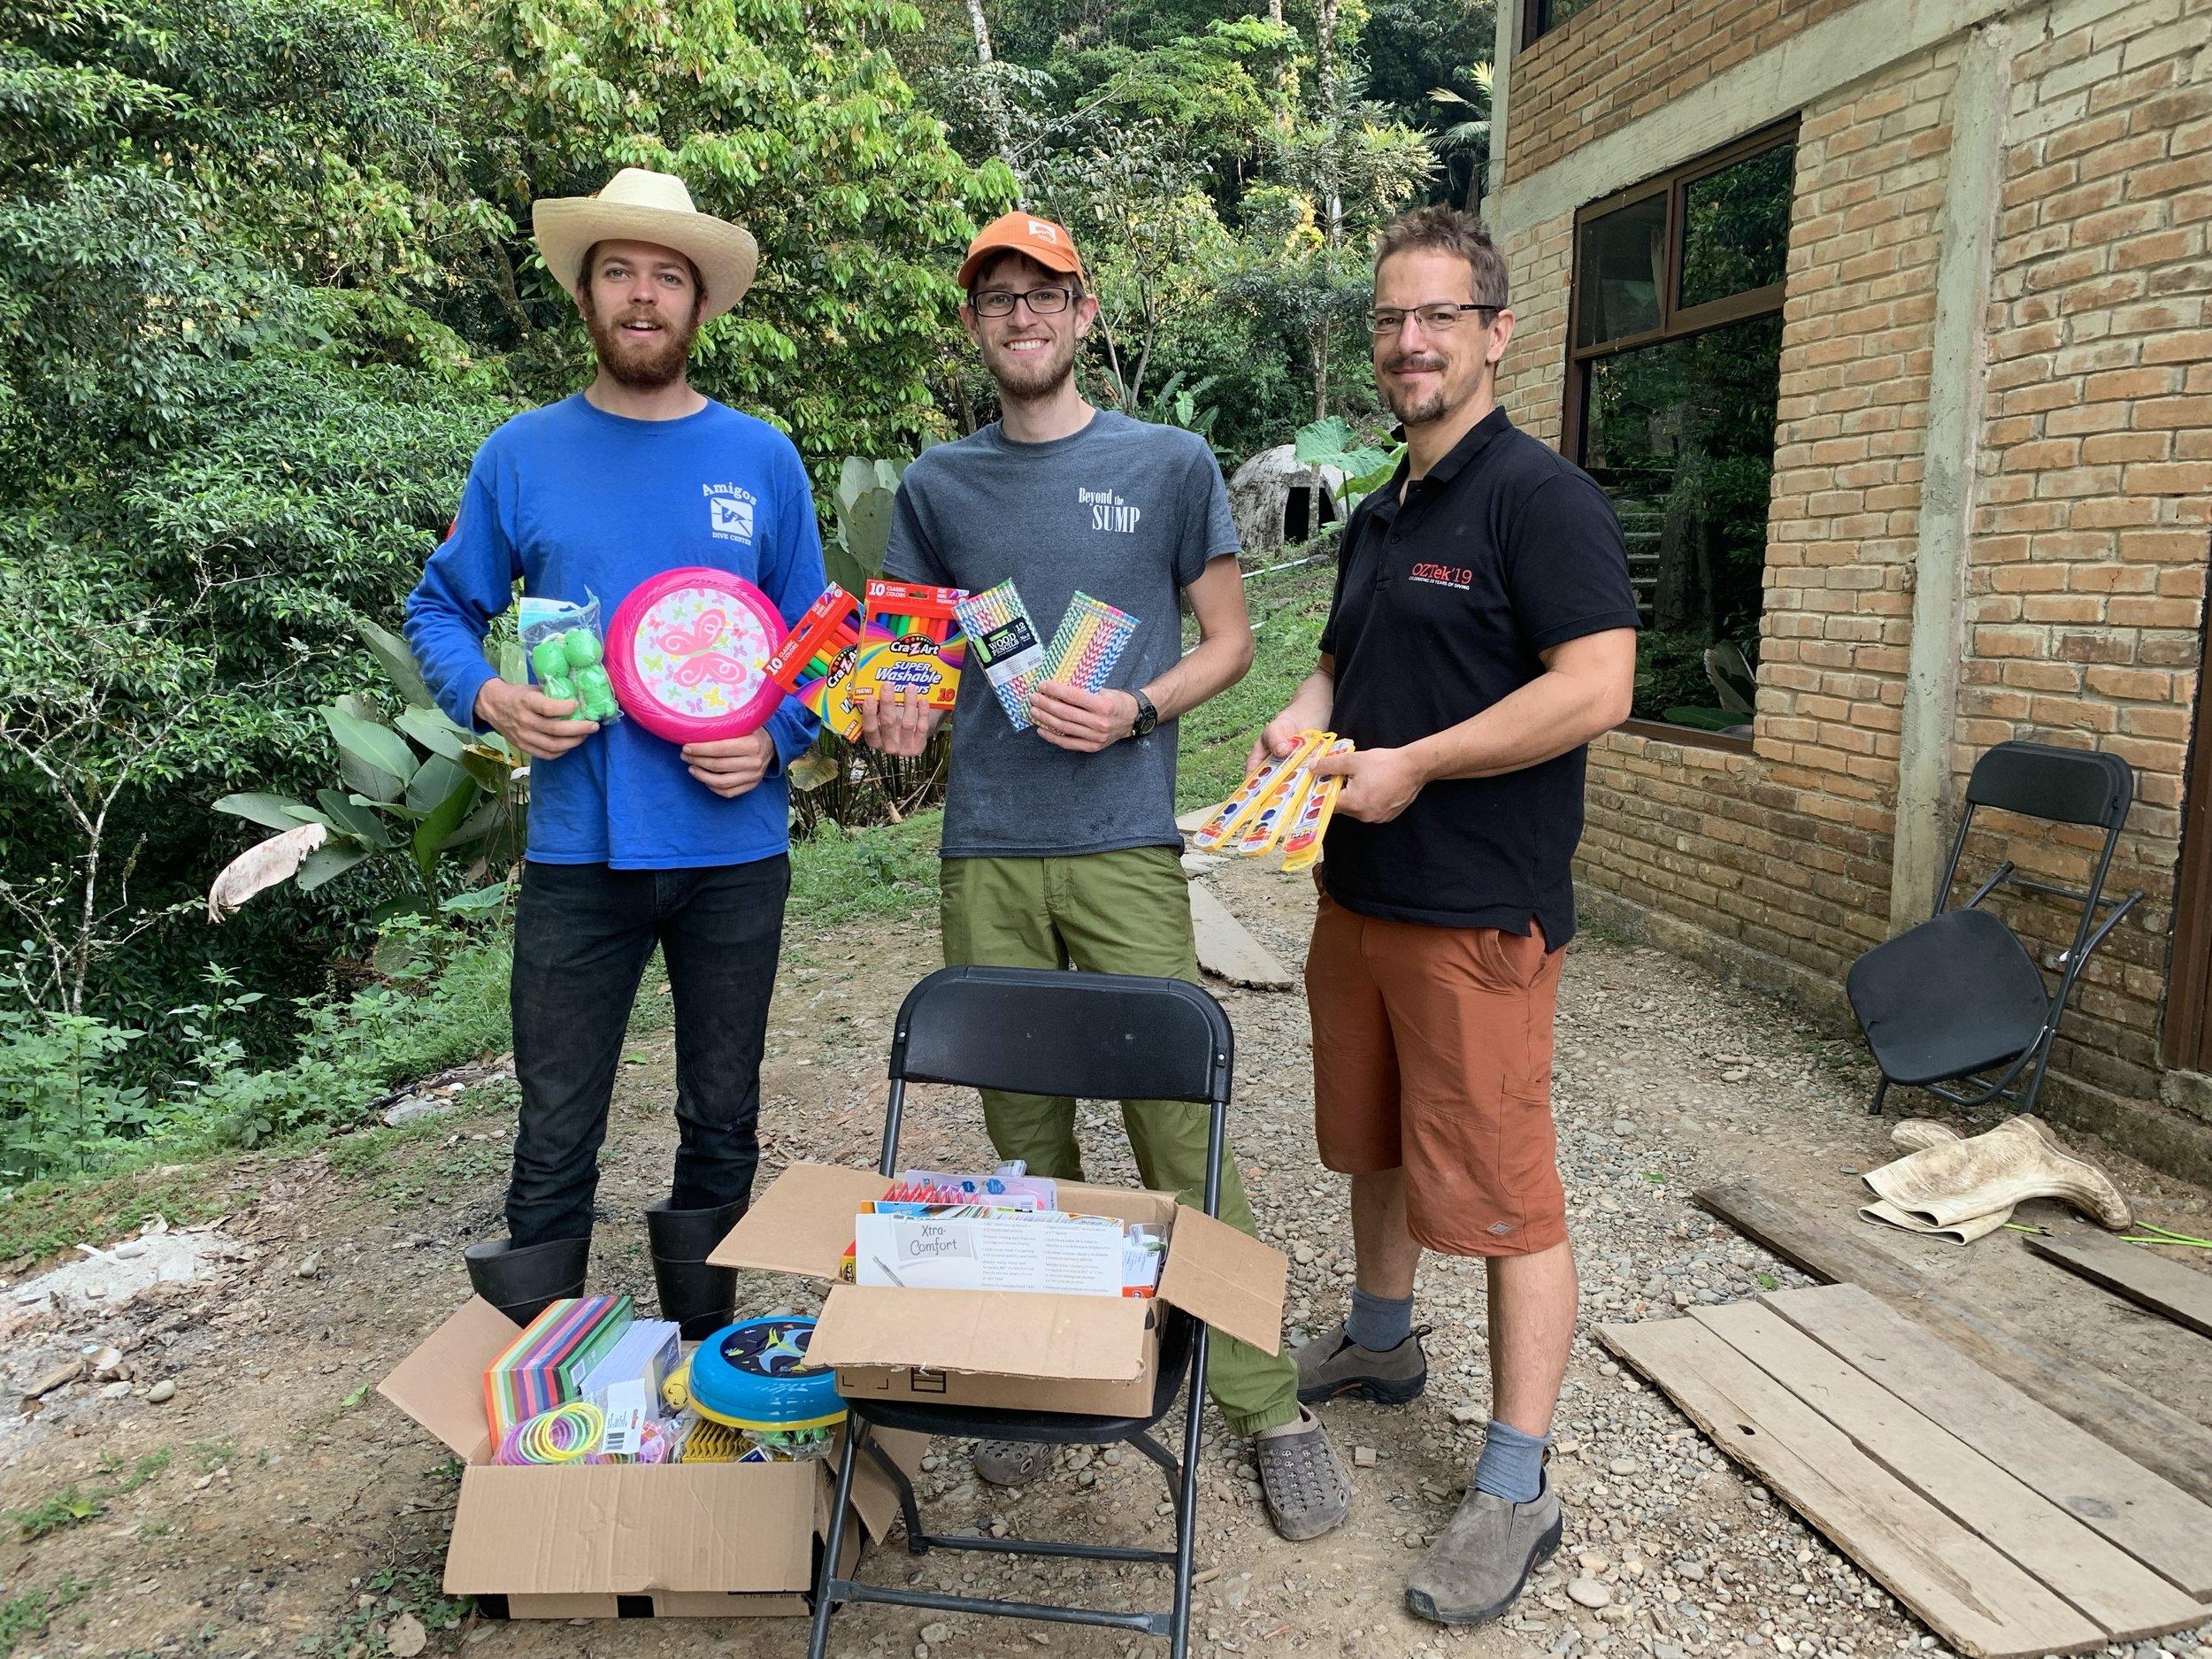 Steve Lambert, Teddy Garlock, and Andreas Klocker with school supplies for the local kids.